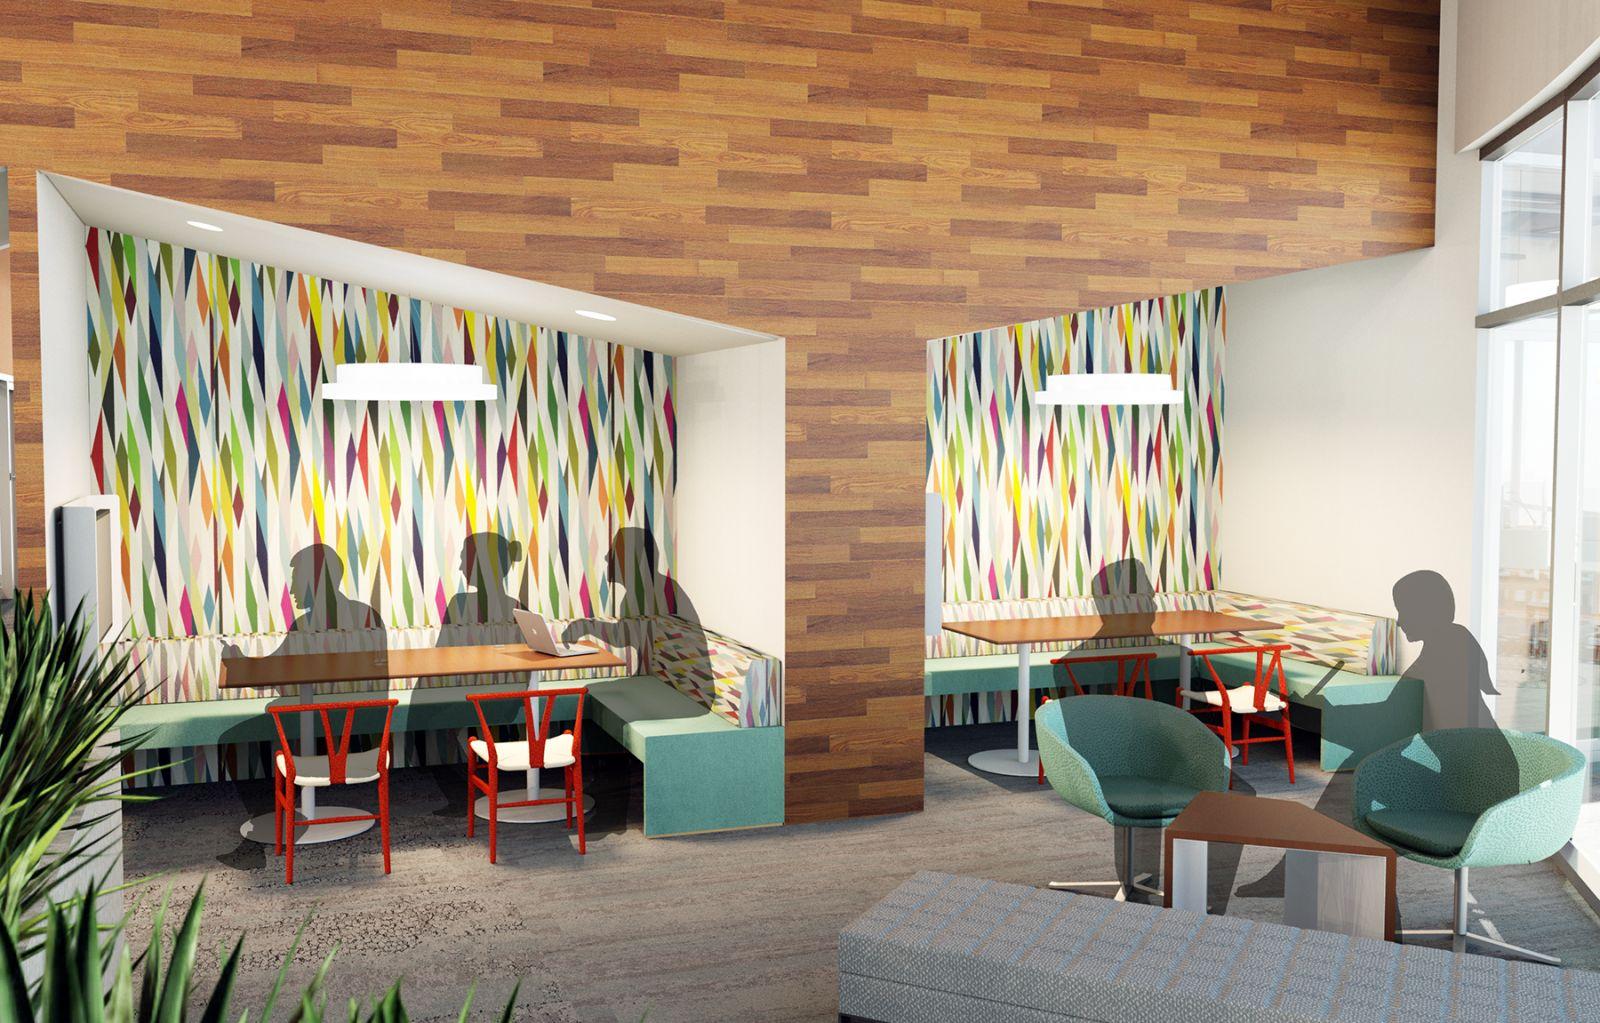 Home Interiors Furniture And Design Cedar Falls Ia ~ Interior design jobs cedar rapids iowa diepedia